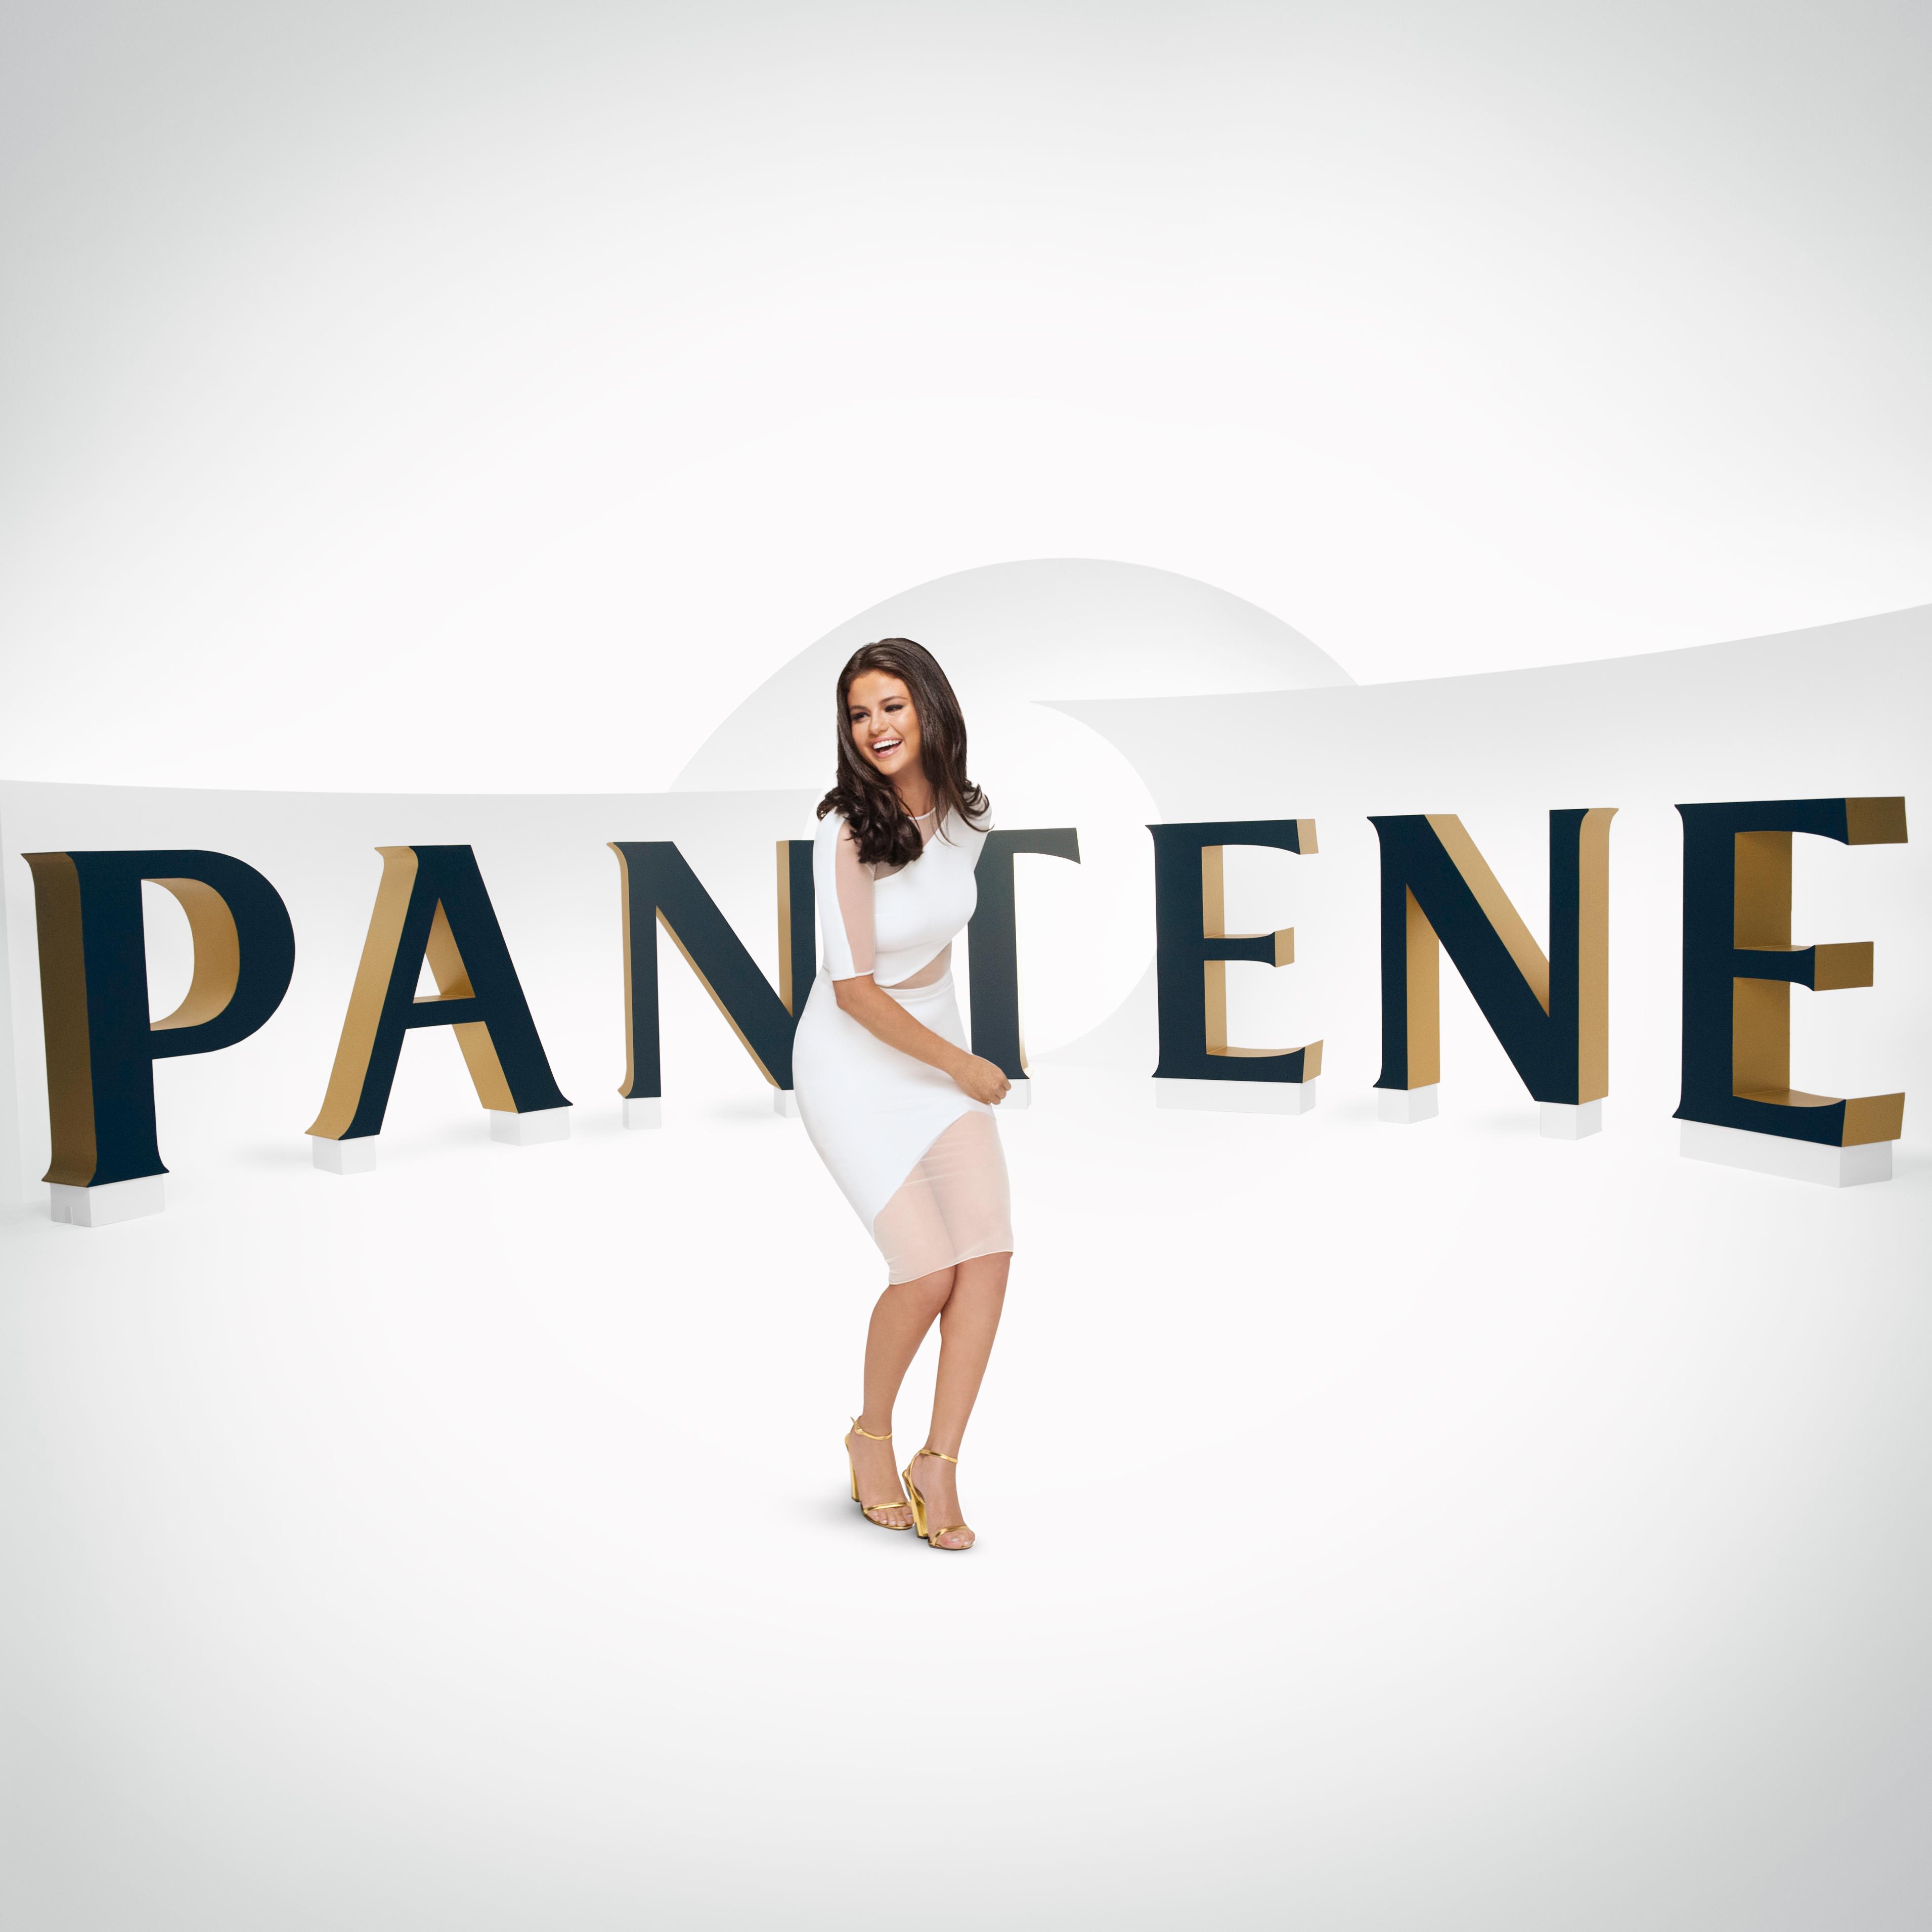 Selena-Gomez-Pantene-01